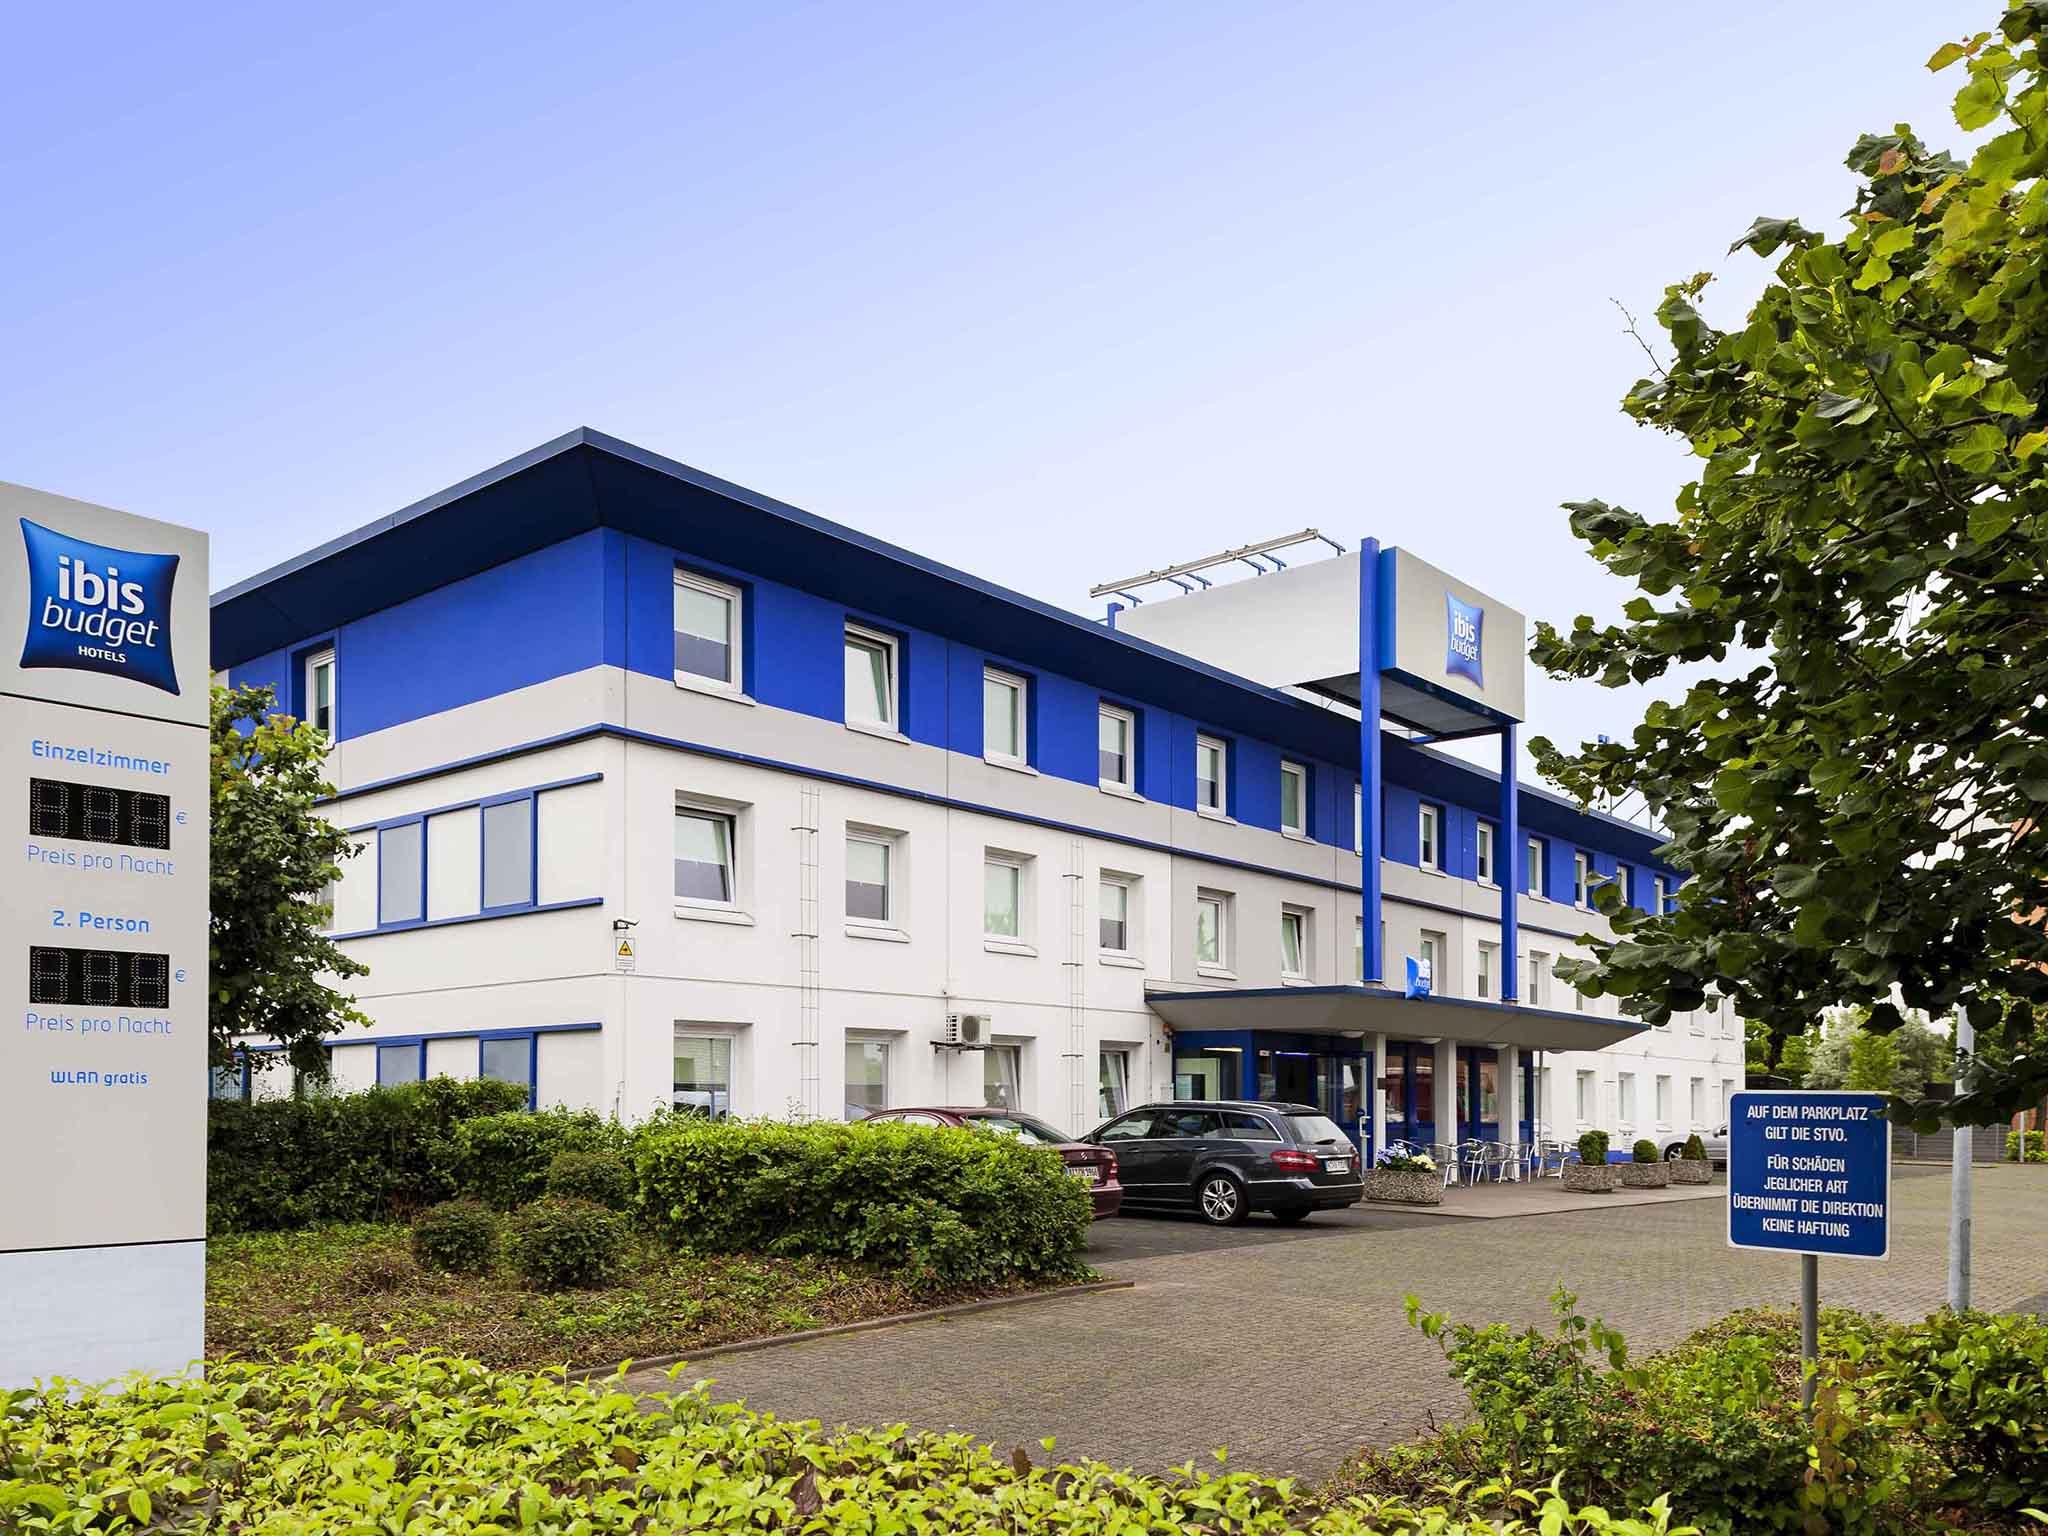 فندق - إيبيس بدجت ibis budget كولن مارسدورف